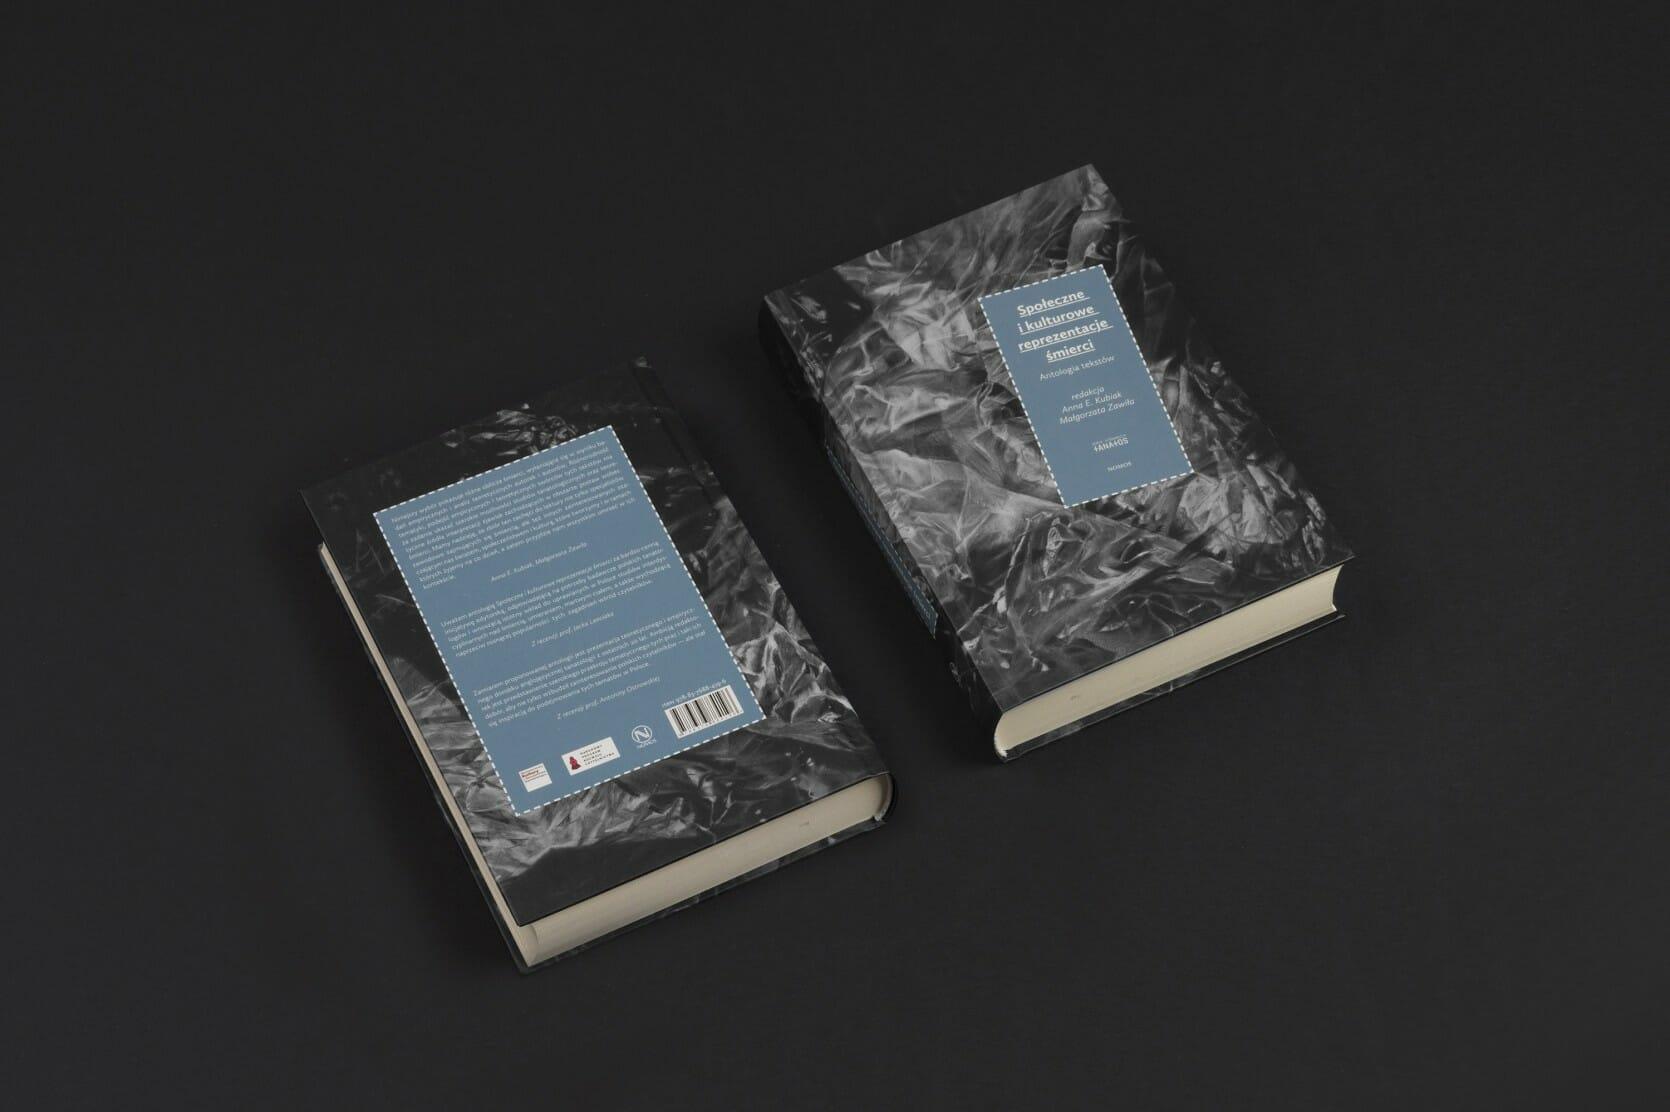 Thanatos book series - volume 2